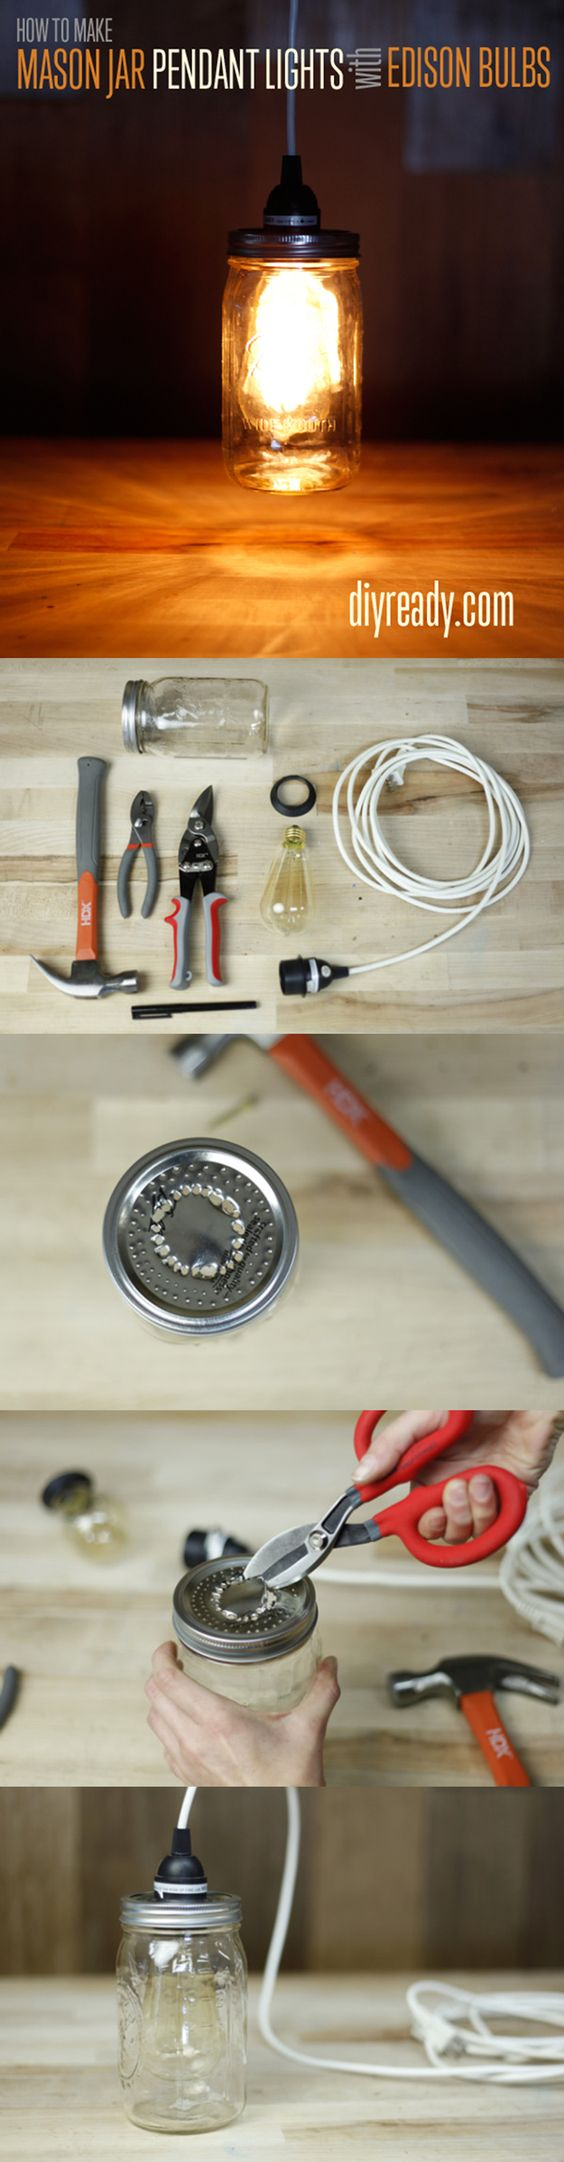 Mason Jar Pendant Lights   26 DIY Mason Jar Crafts You Can Make In Under an Hour at http://diyready/com/mason-jar-crafts-in-under-an-hour